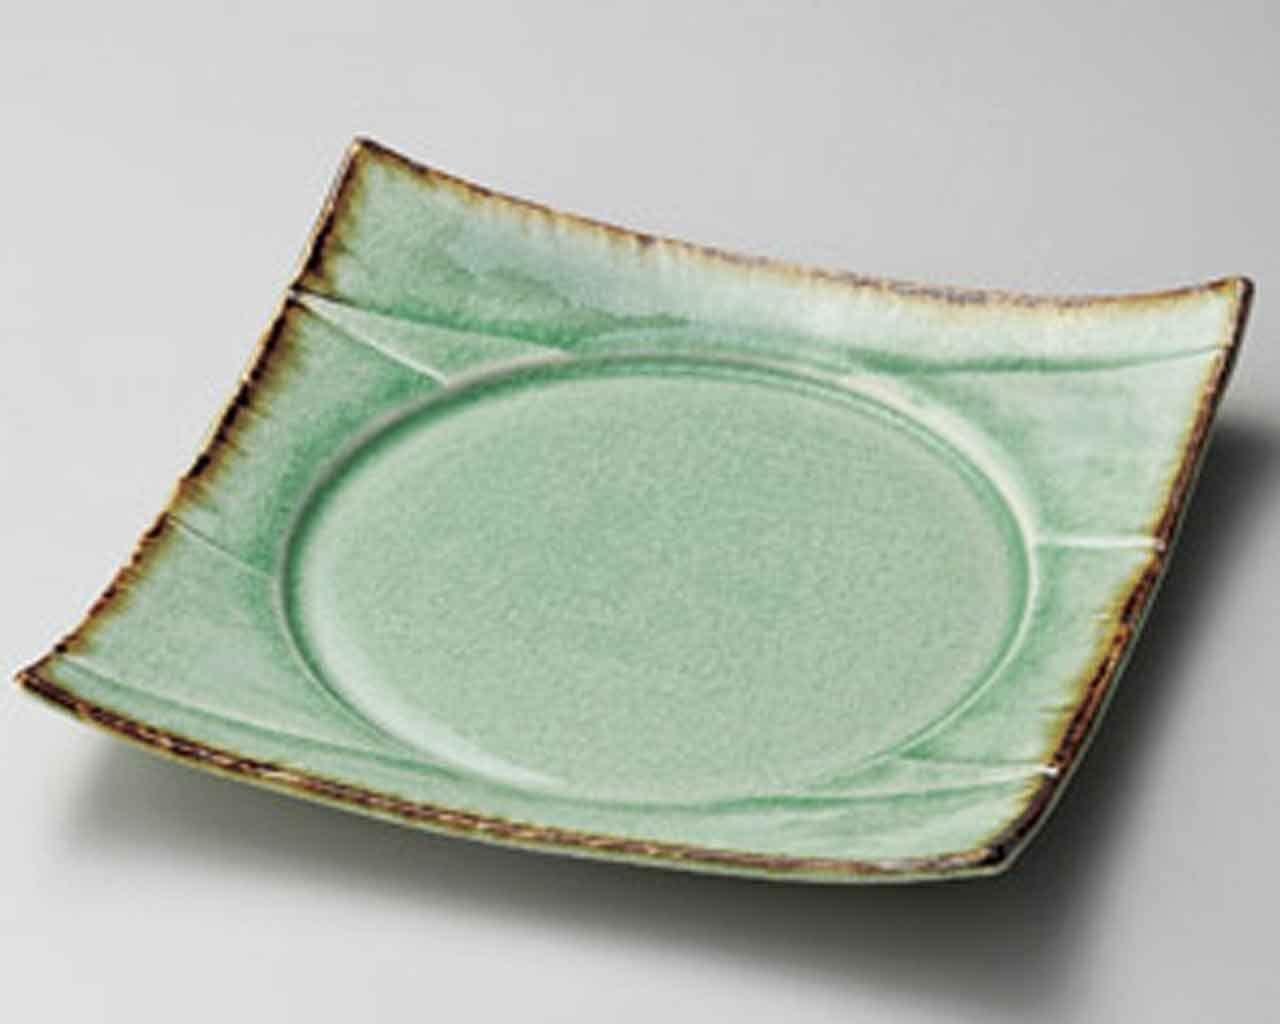 Suigyoku 6.9inch Set of 2 Medium Plates Green porcelain Made in Japan